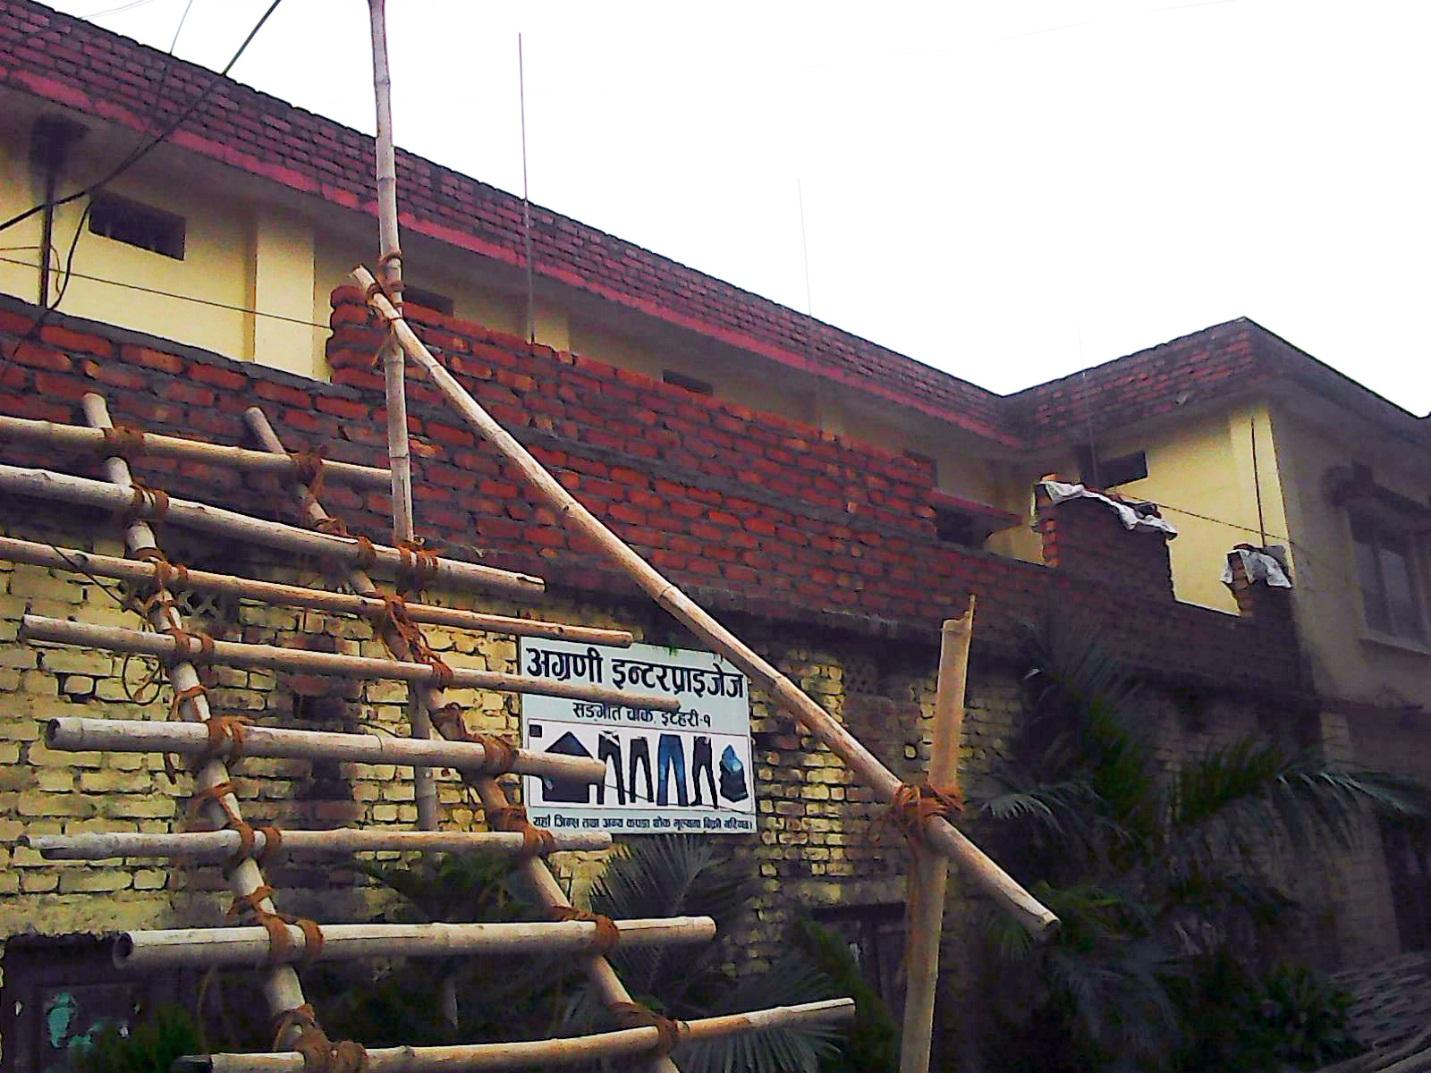 itahari upmaha mapdand biparit ghar building construction